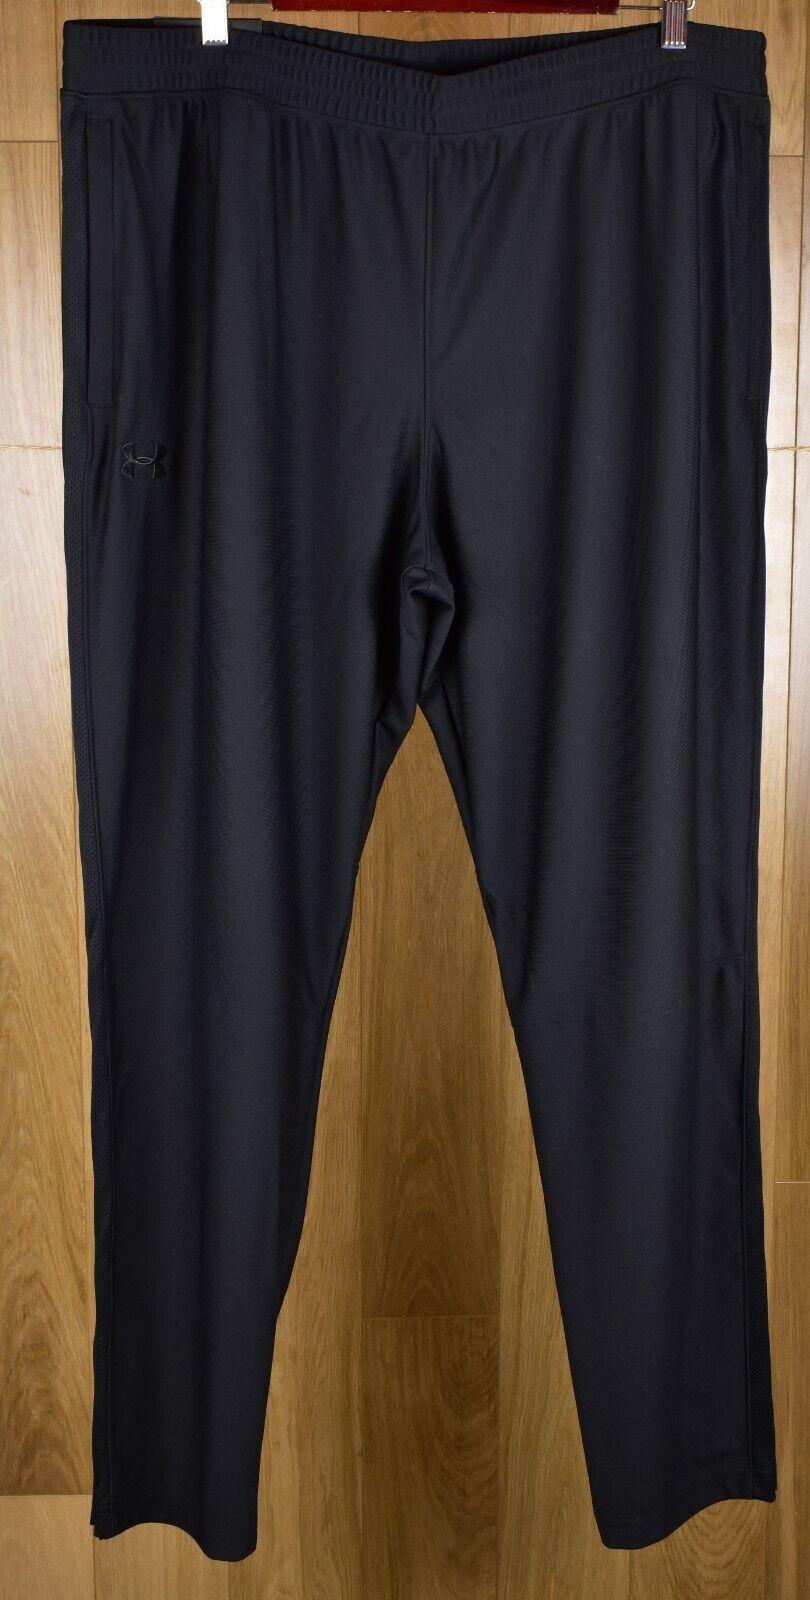 NWT Under Armour Mens UA Sportstyle Pique Training Pants Sz Ex Large Grey//White